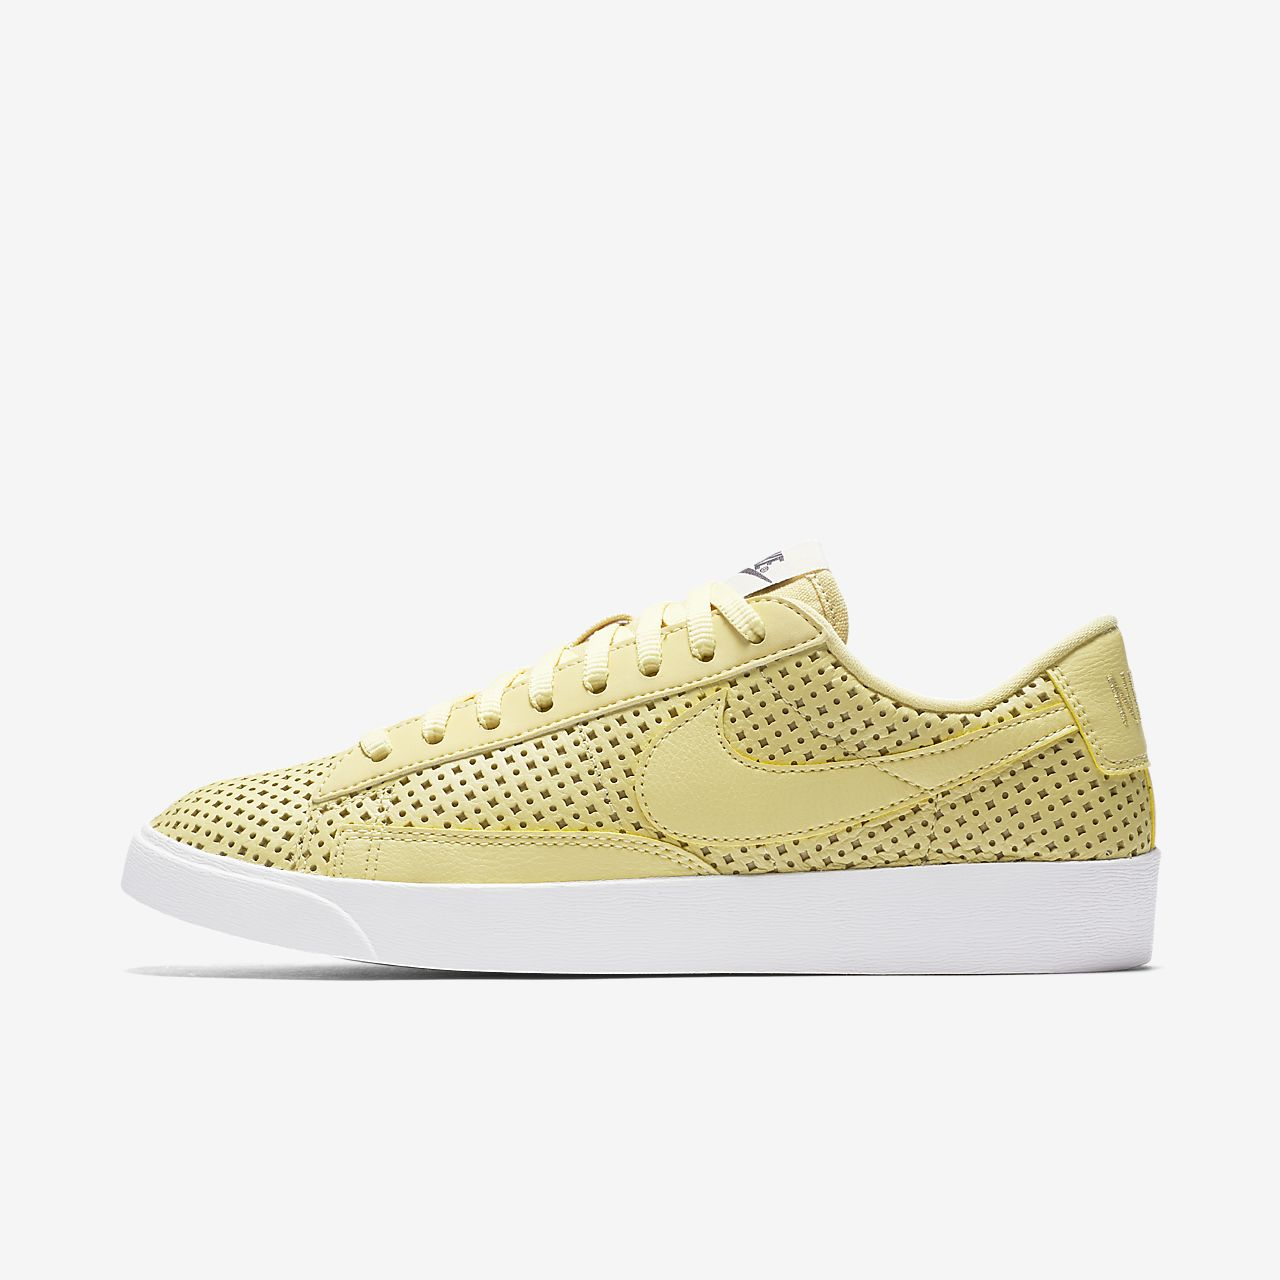 7409ce8abf5 Nike Blazer Low SE Women s Shoe. Nike.com